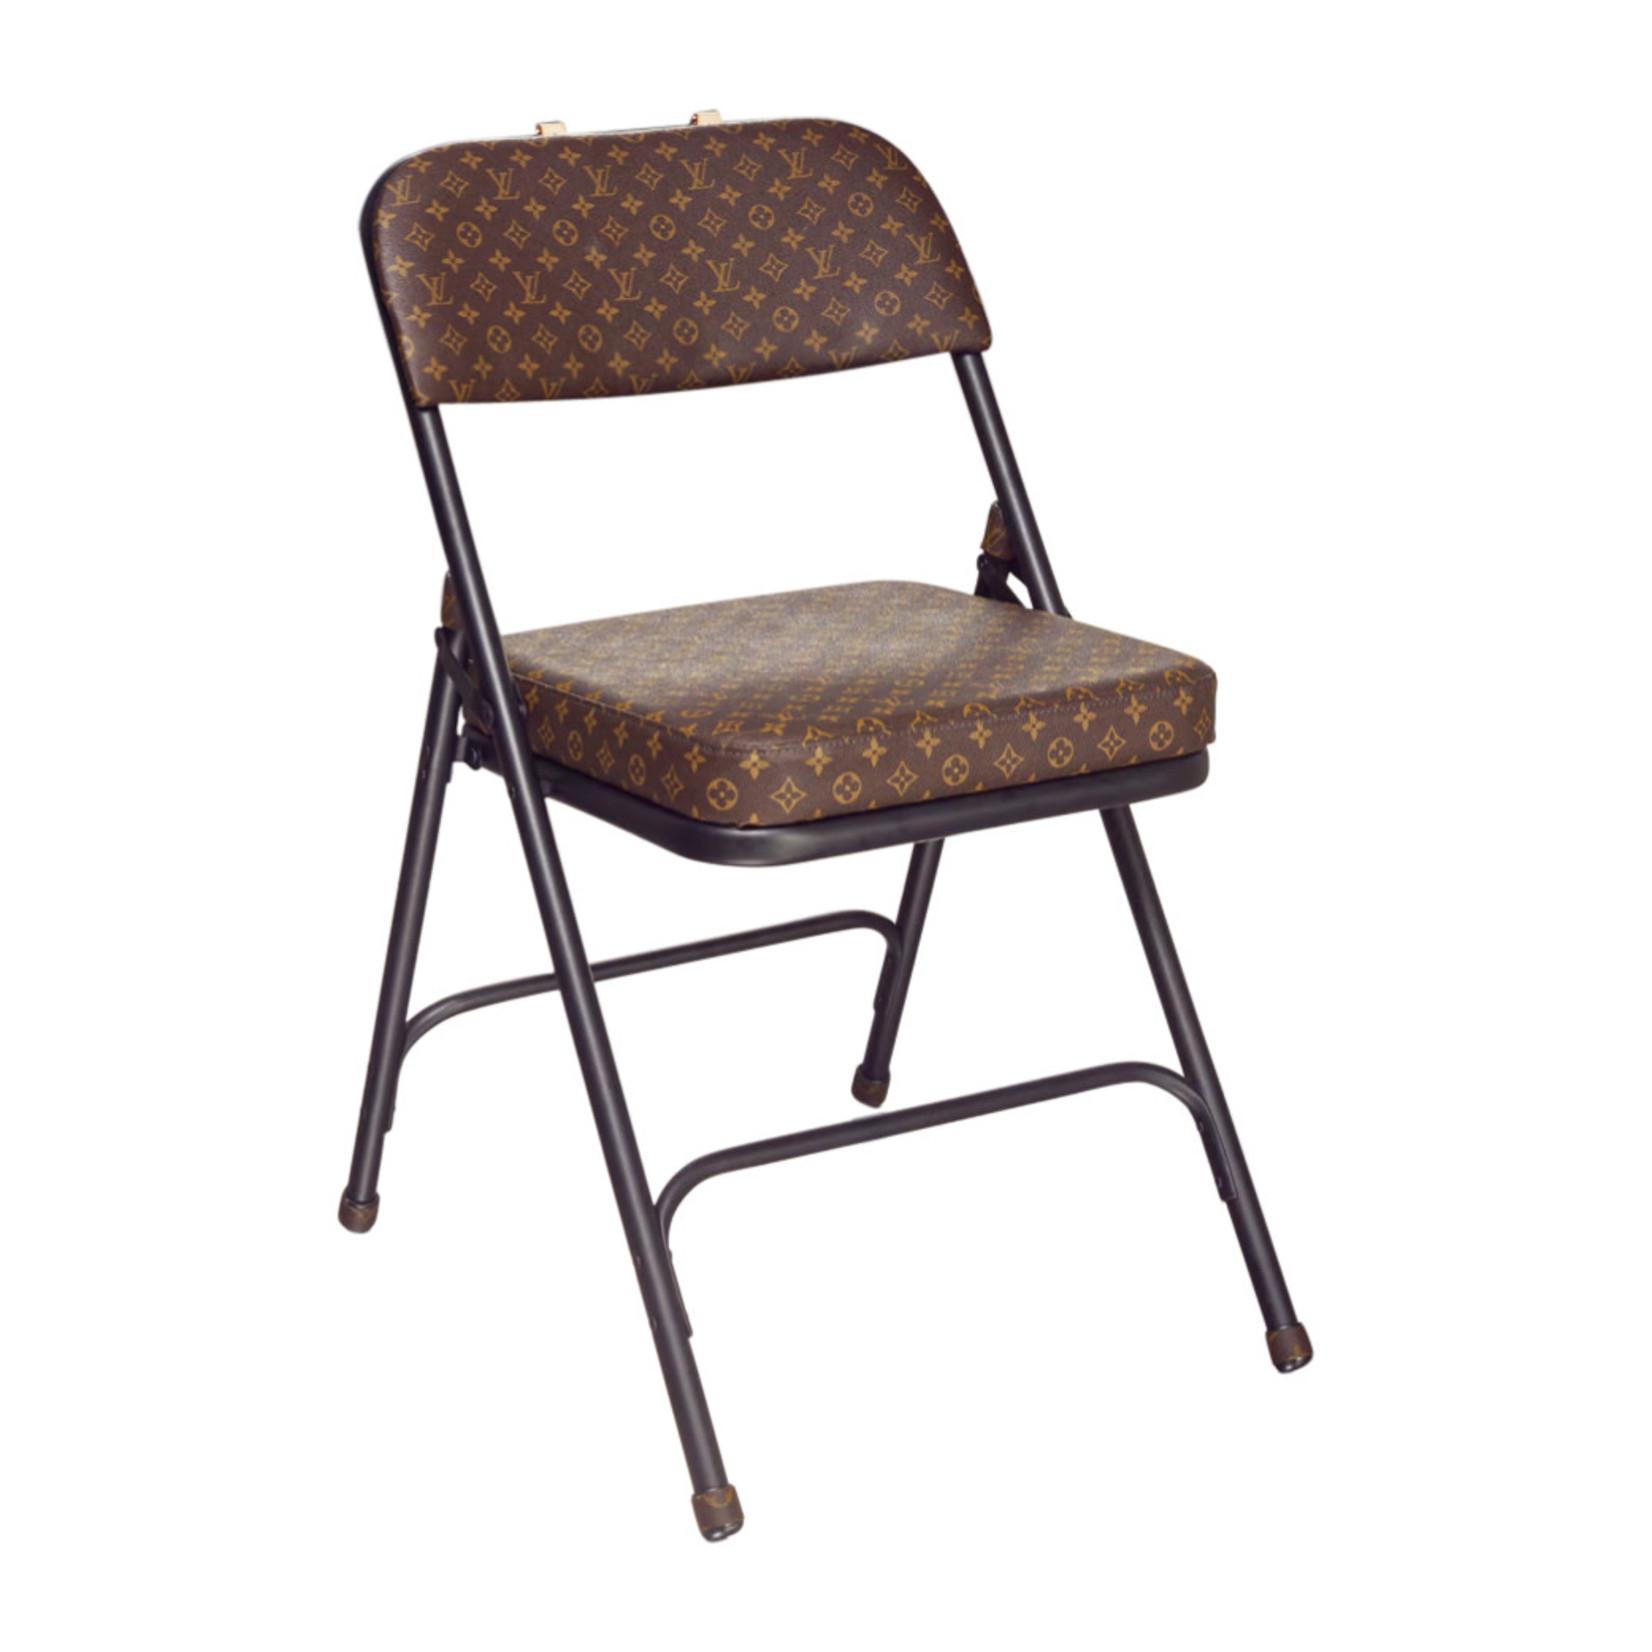 Sarah Coleman Designer Art Chair